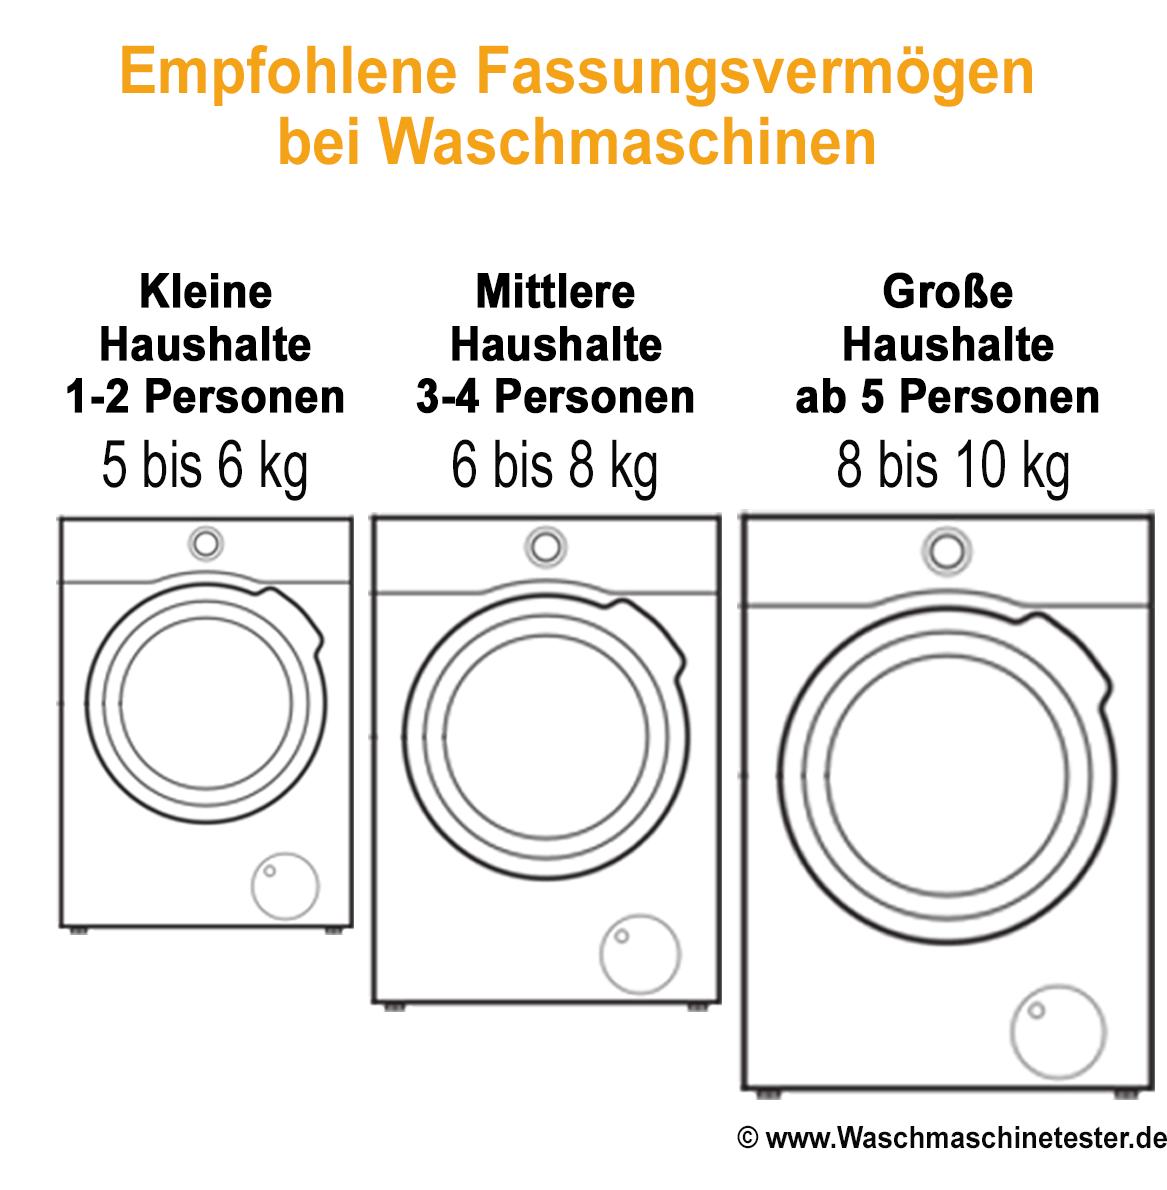 Illustration: Fassungsvermögen bei Waschmaschinen ©www.waschmaschinetester.de